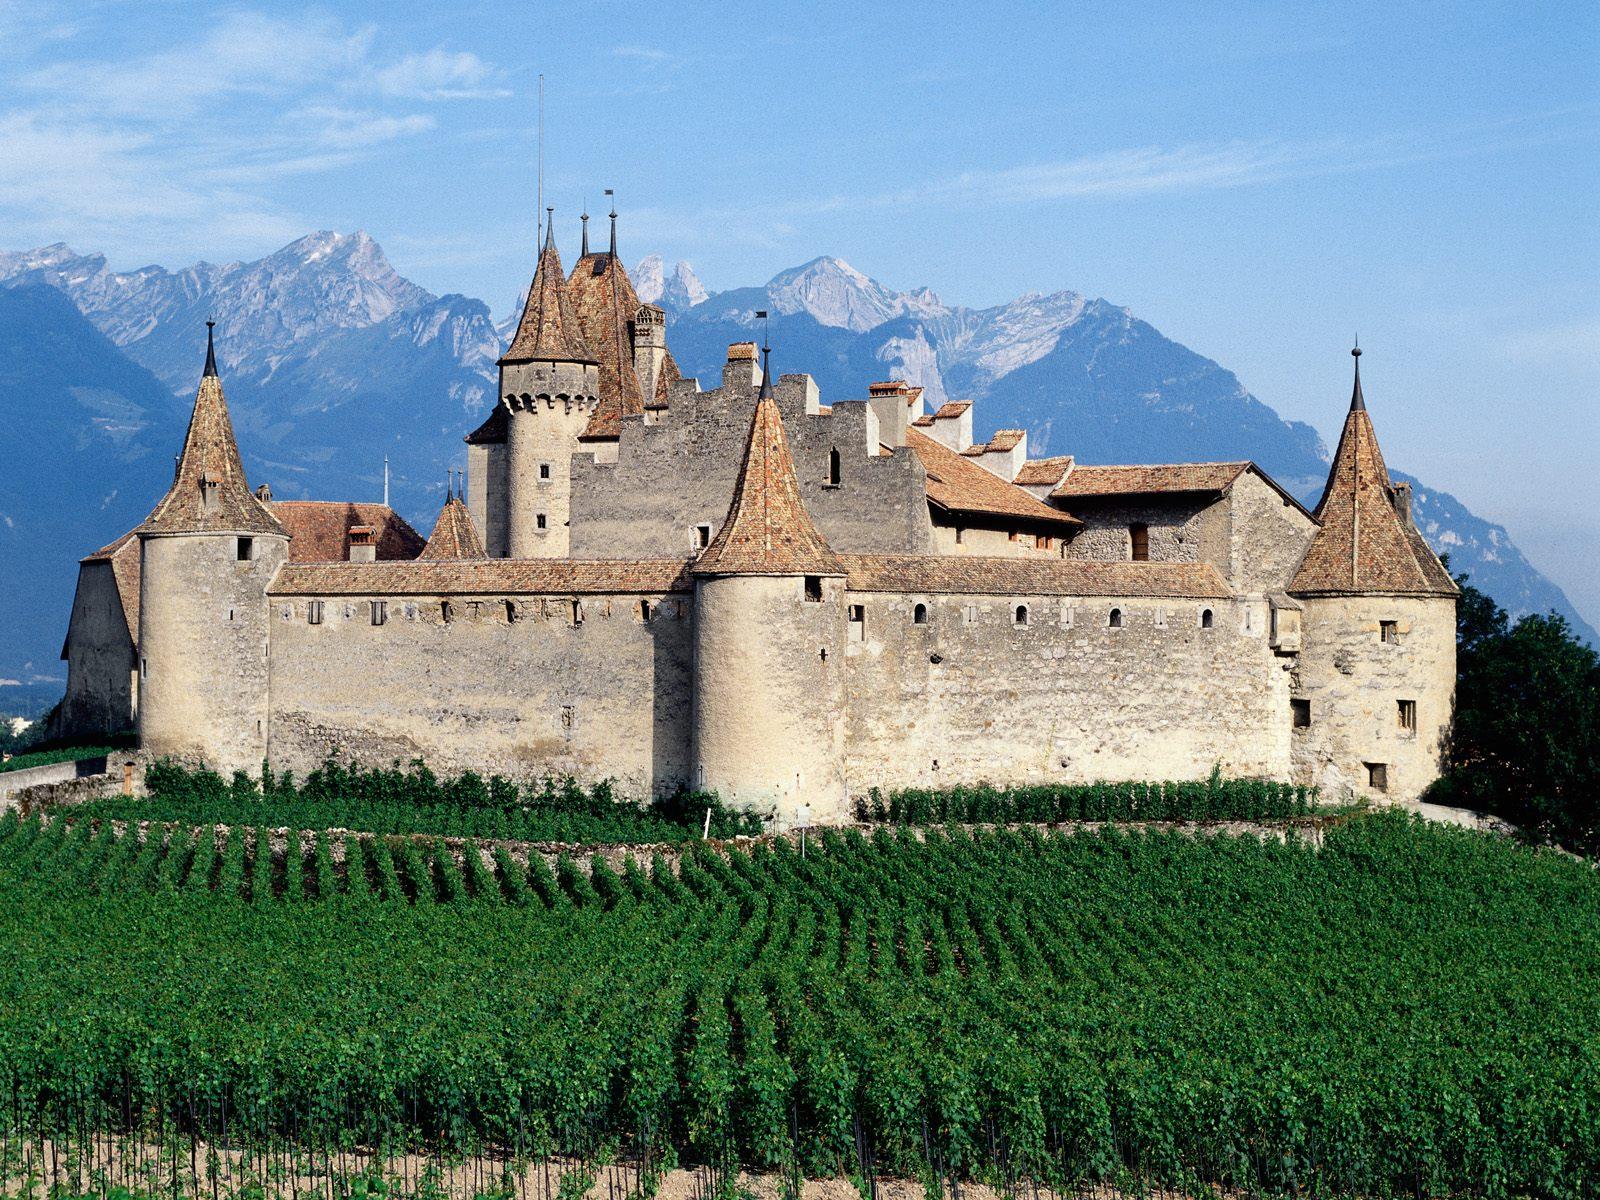 Chateau_d'Aigle_Switzerland.jpg